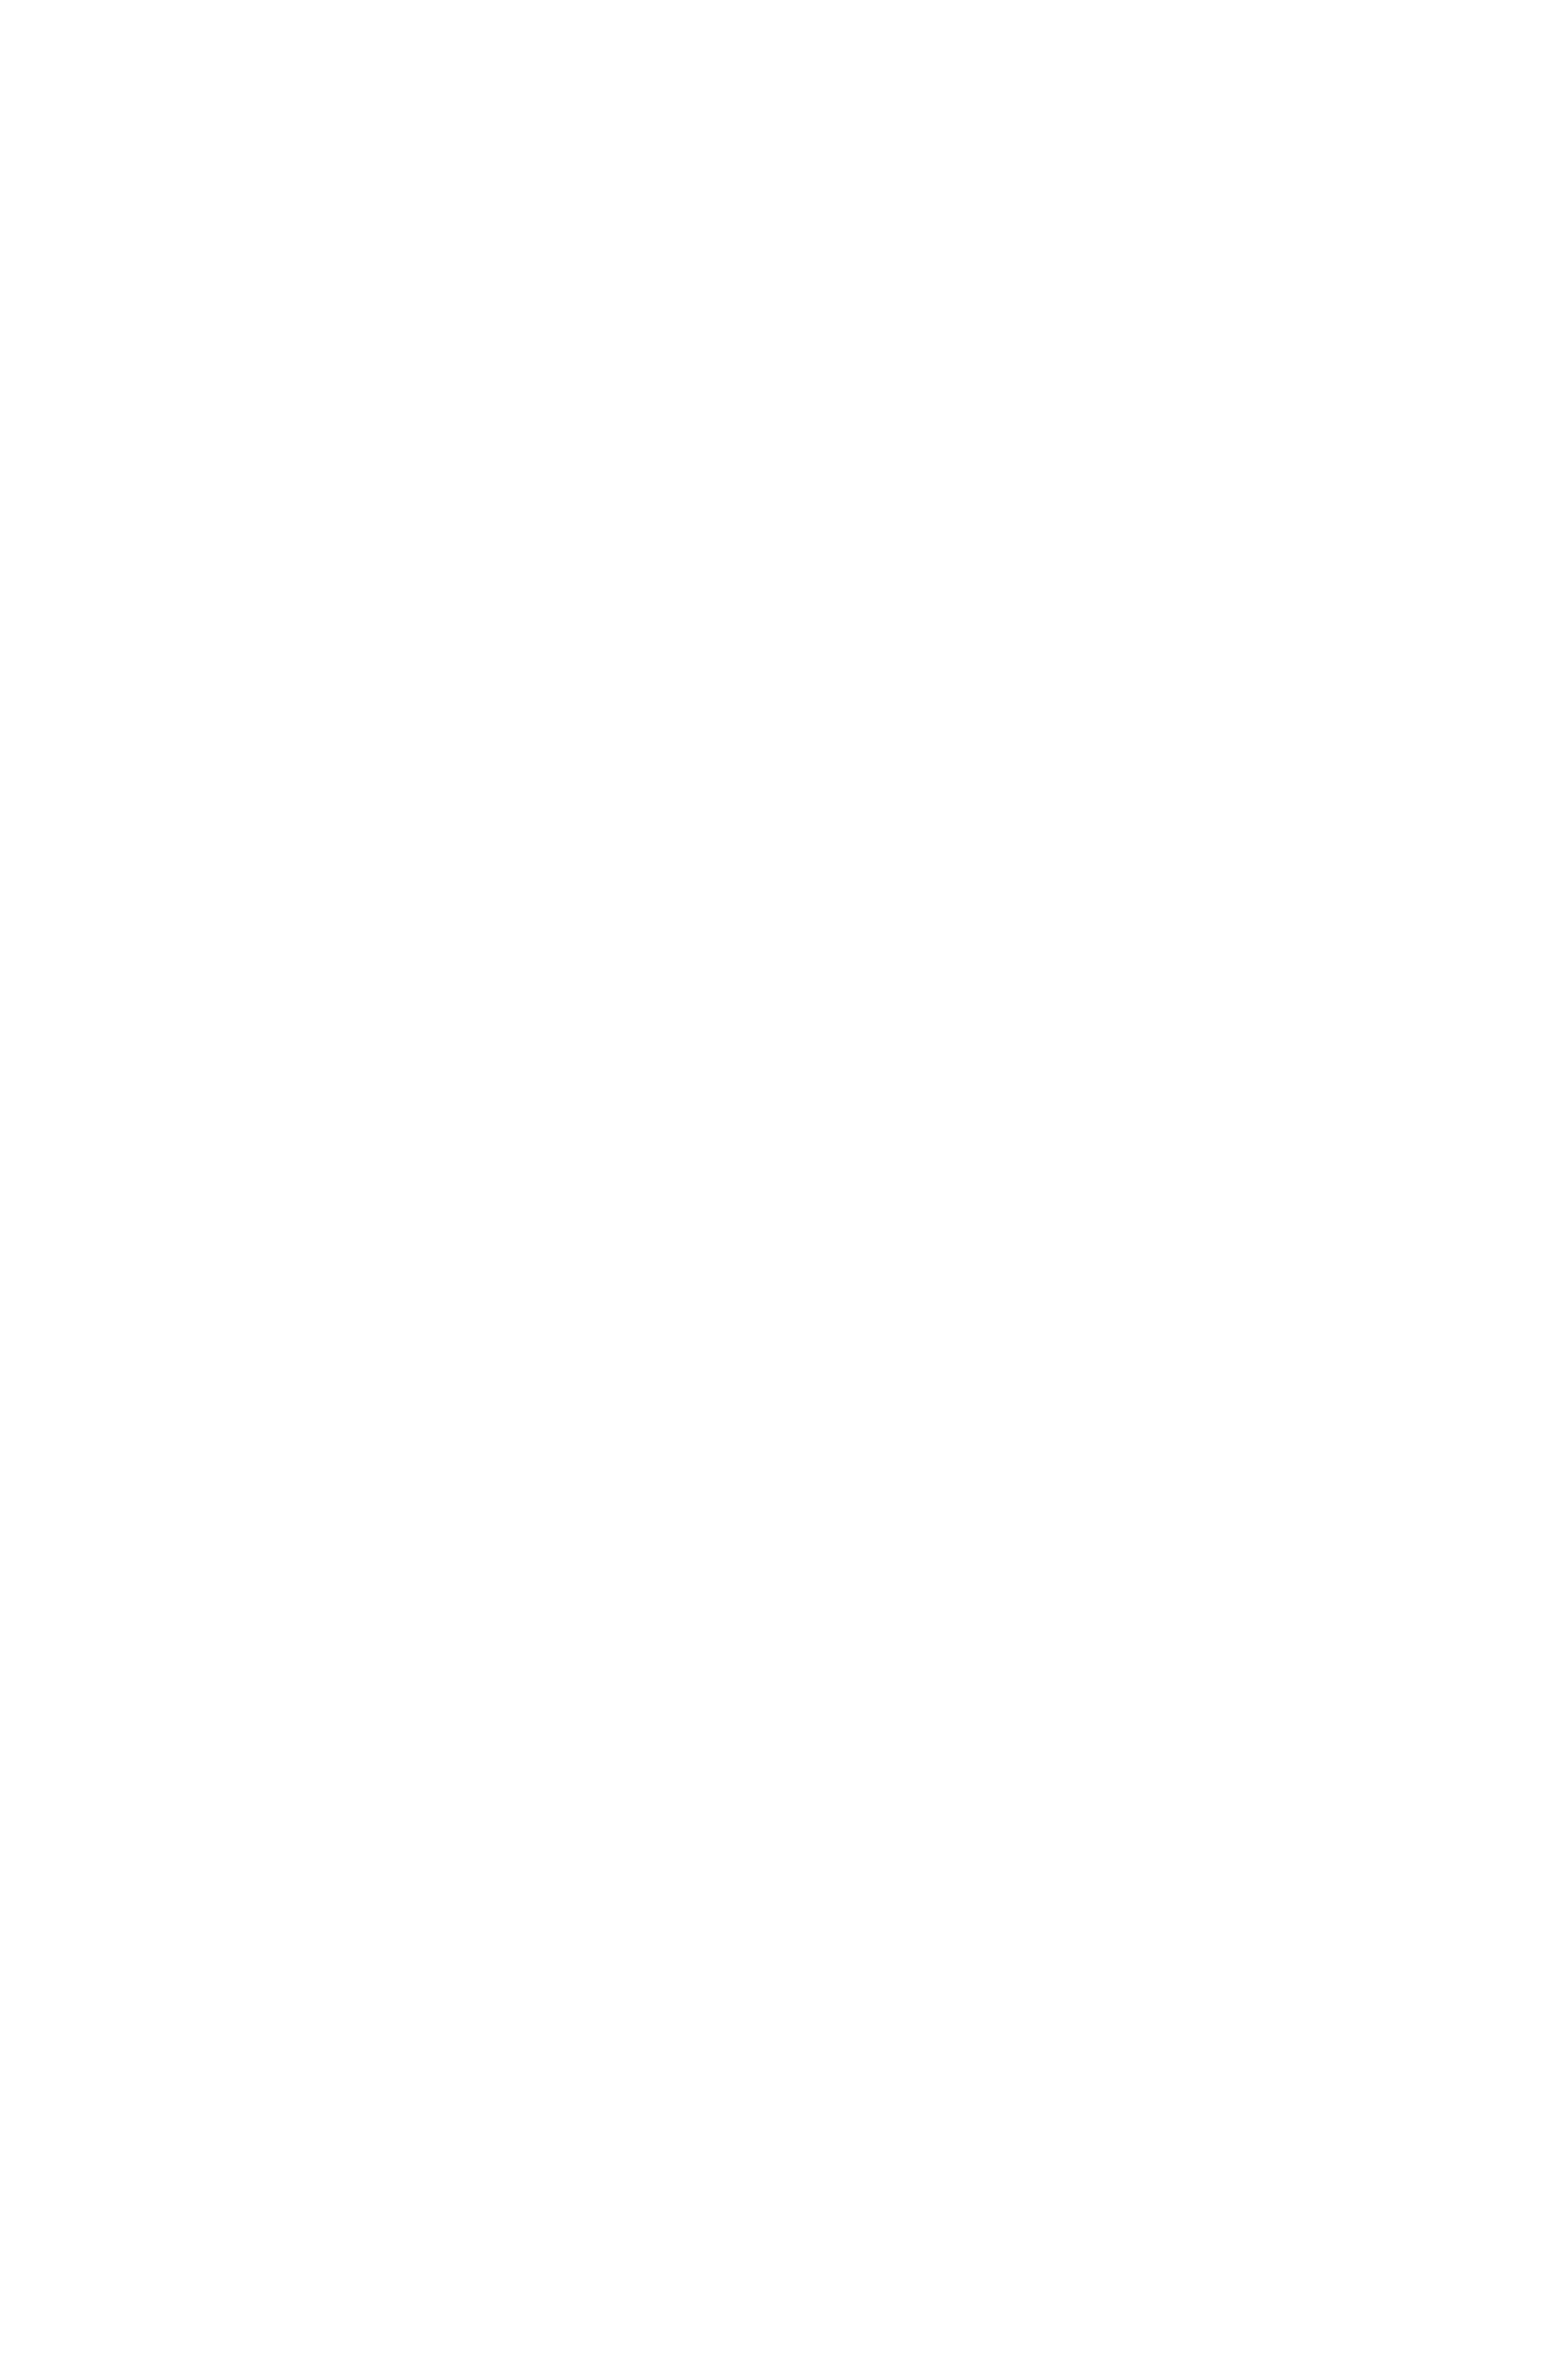 Madarozzo / EDU / Funda de alta costura / 20mm PAD